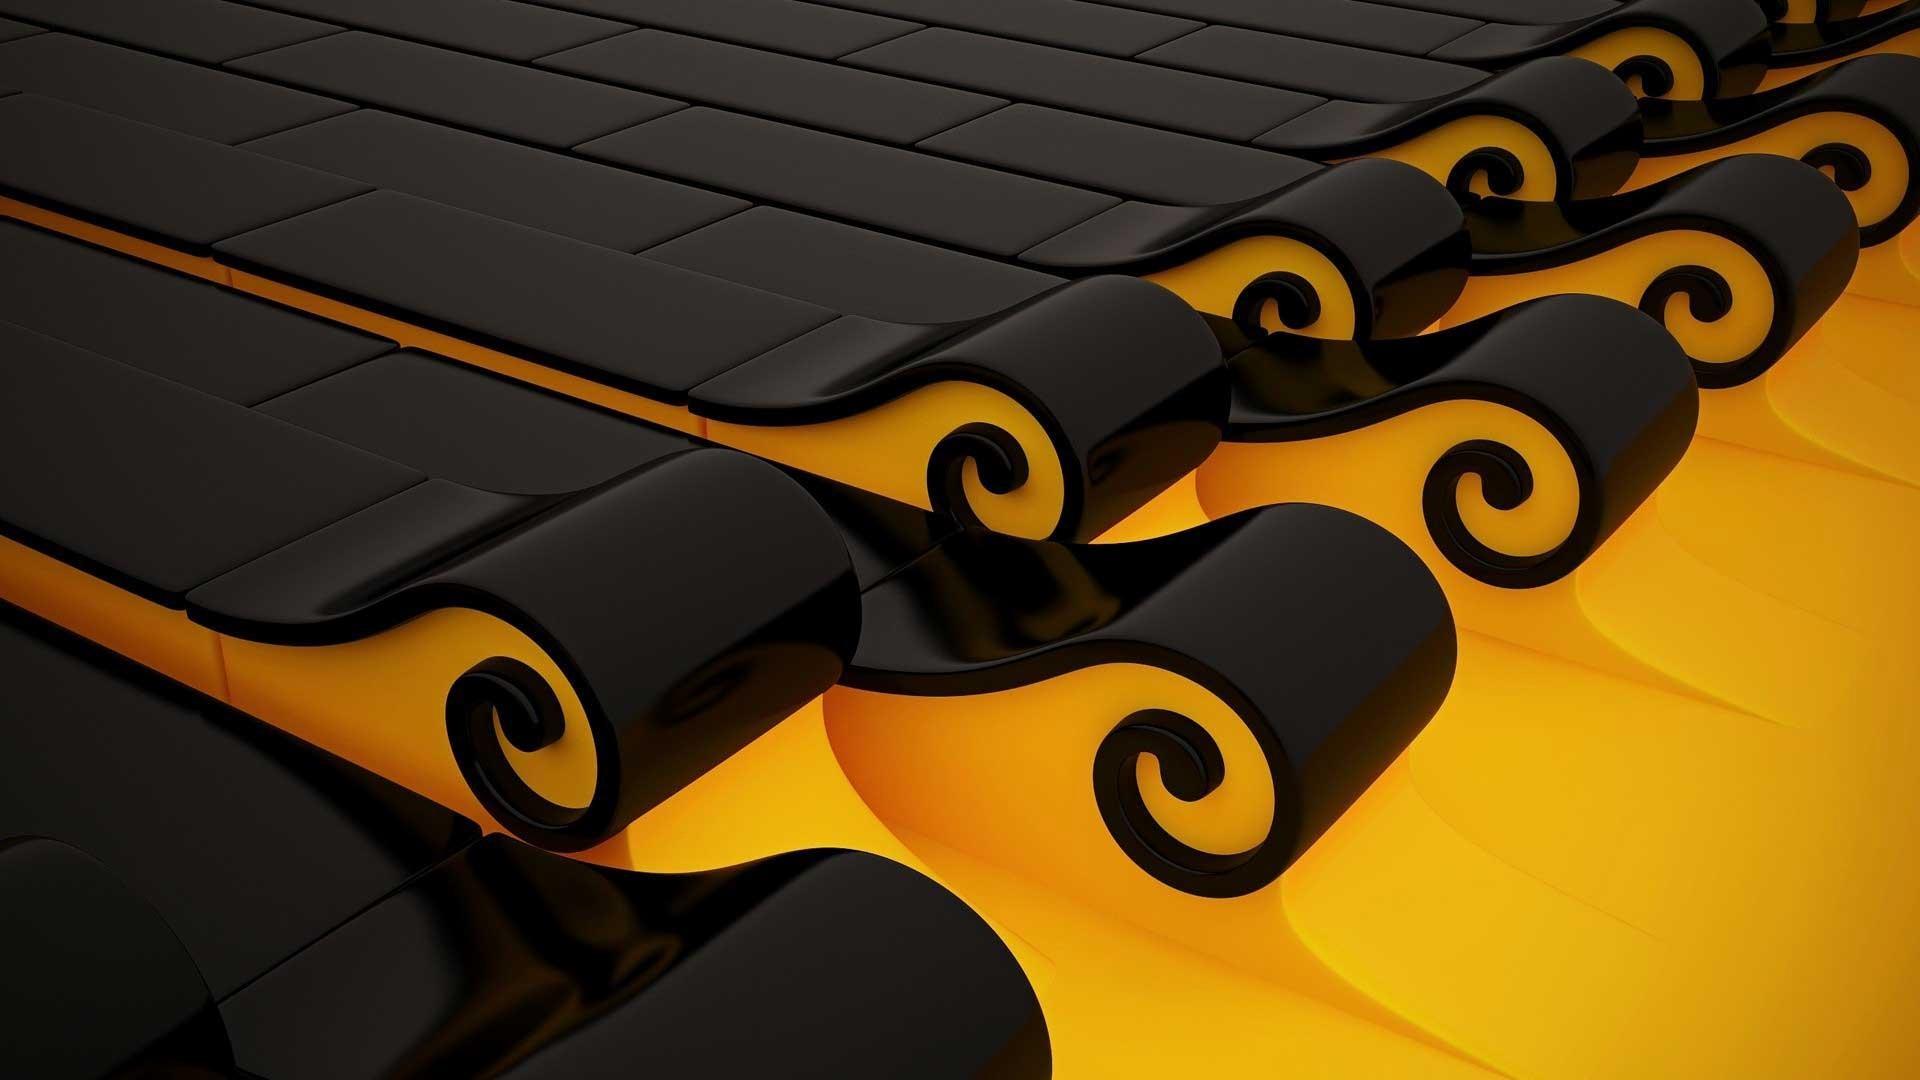 Yellow-And-Black-Art-Spirals-Full-Screen-HD